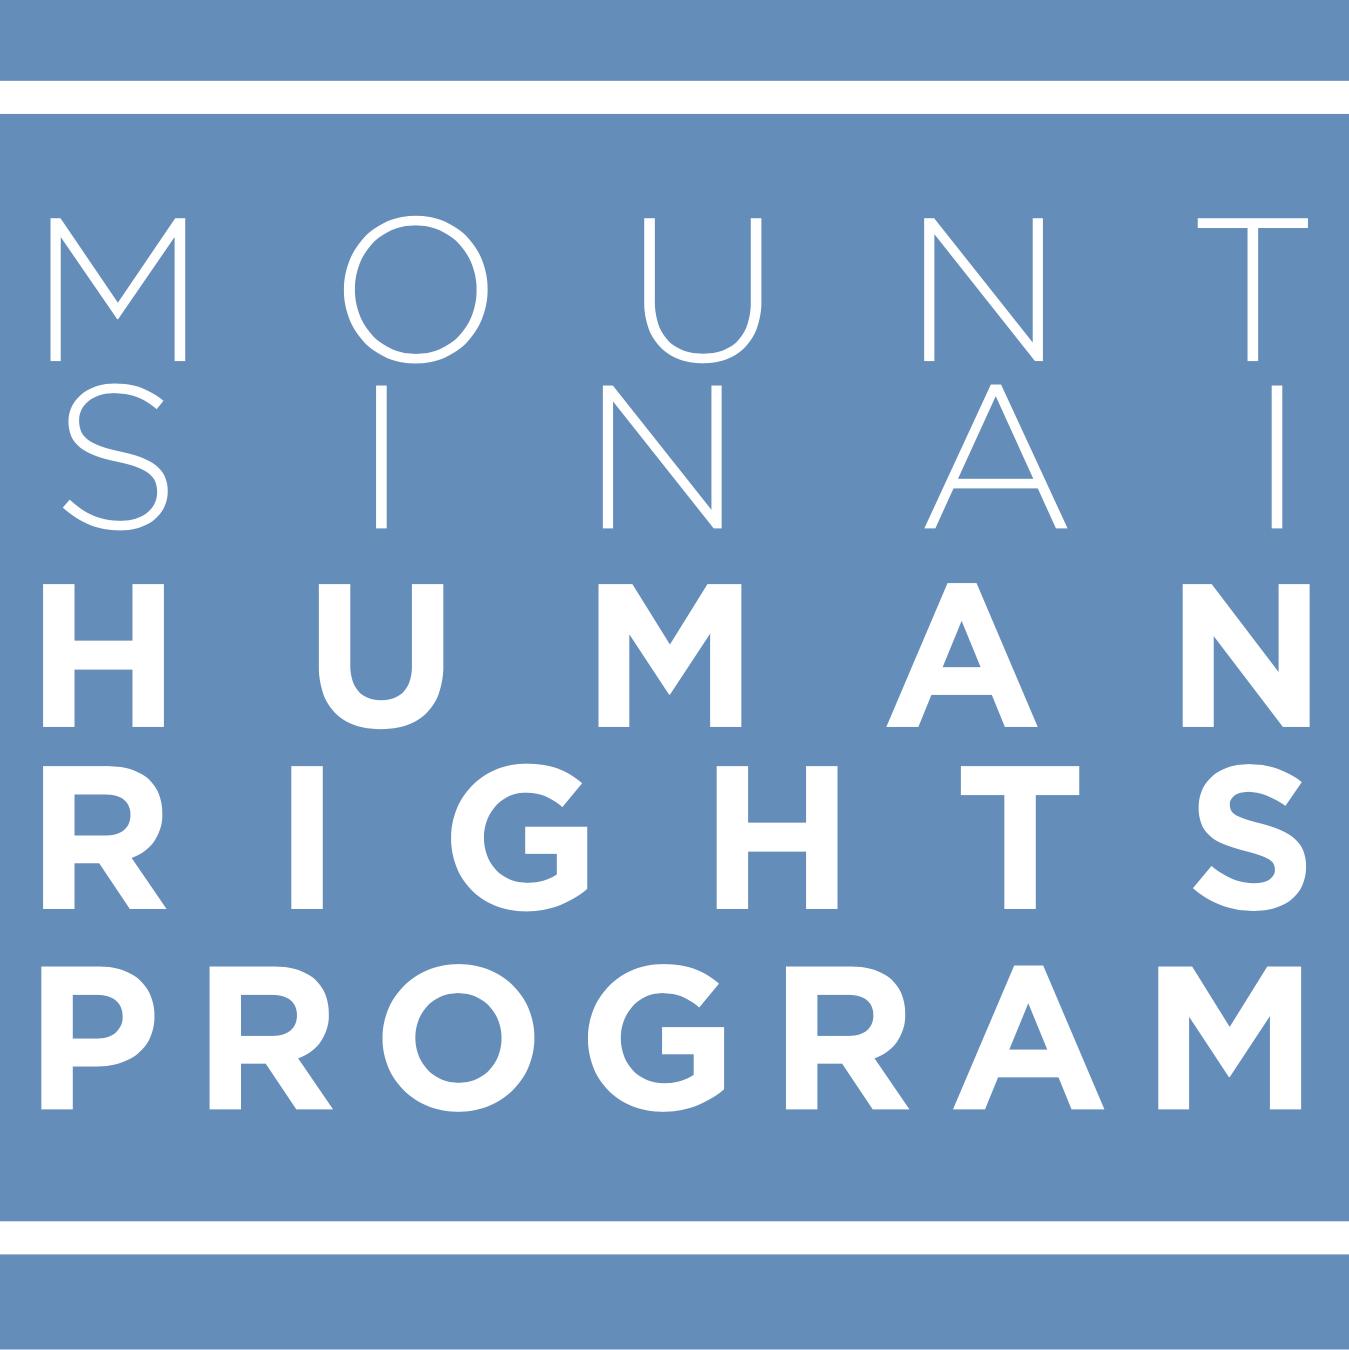 The Mount Sinai Human Rights Program